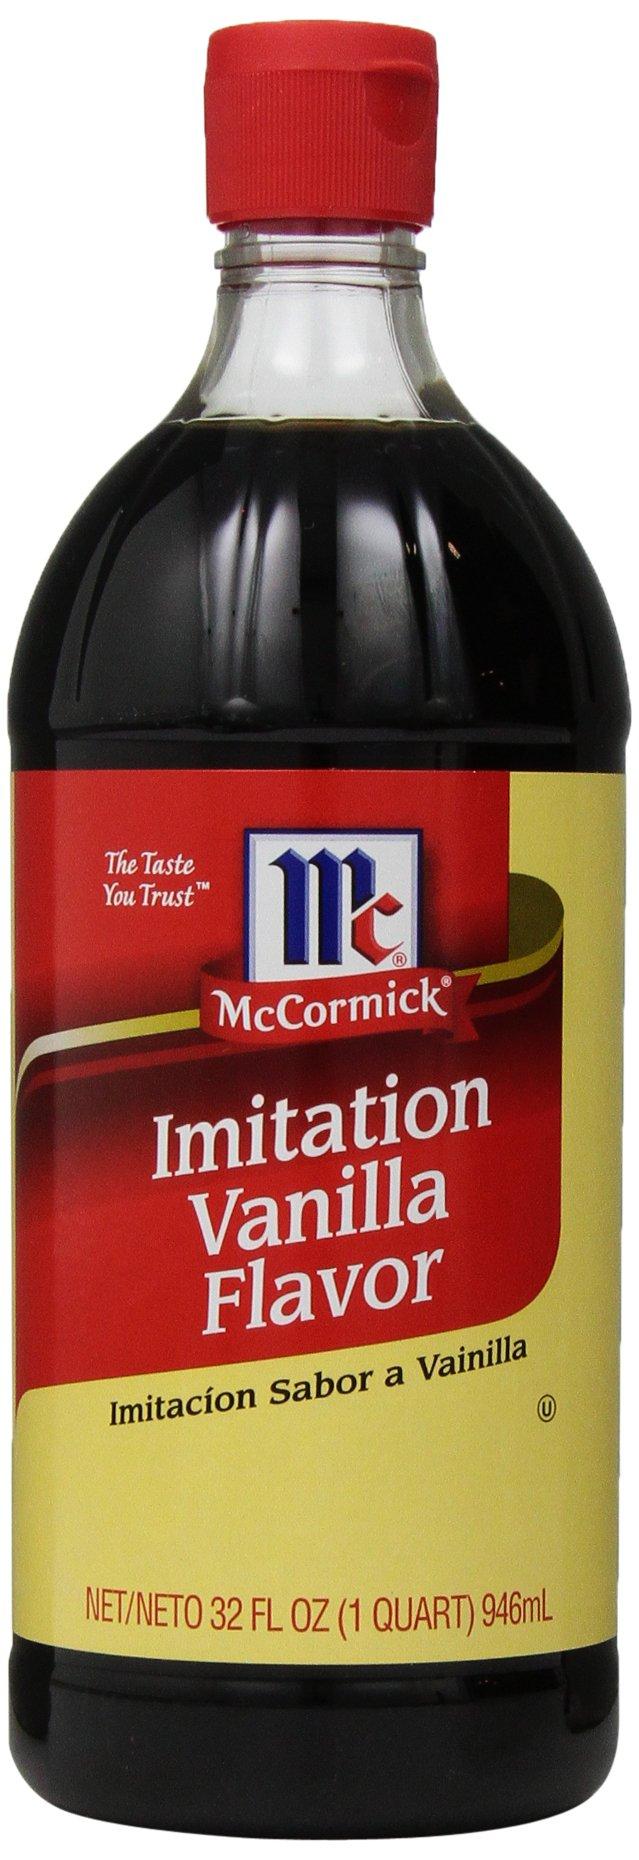 McCormick Imitation Vanilla Flavor, 32 Ounce